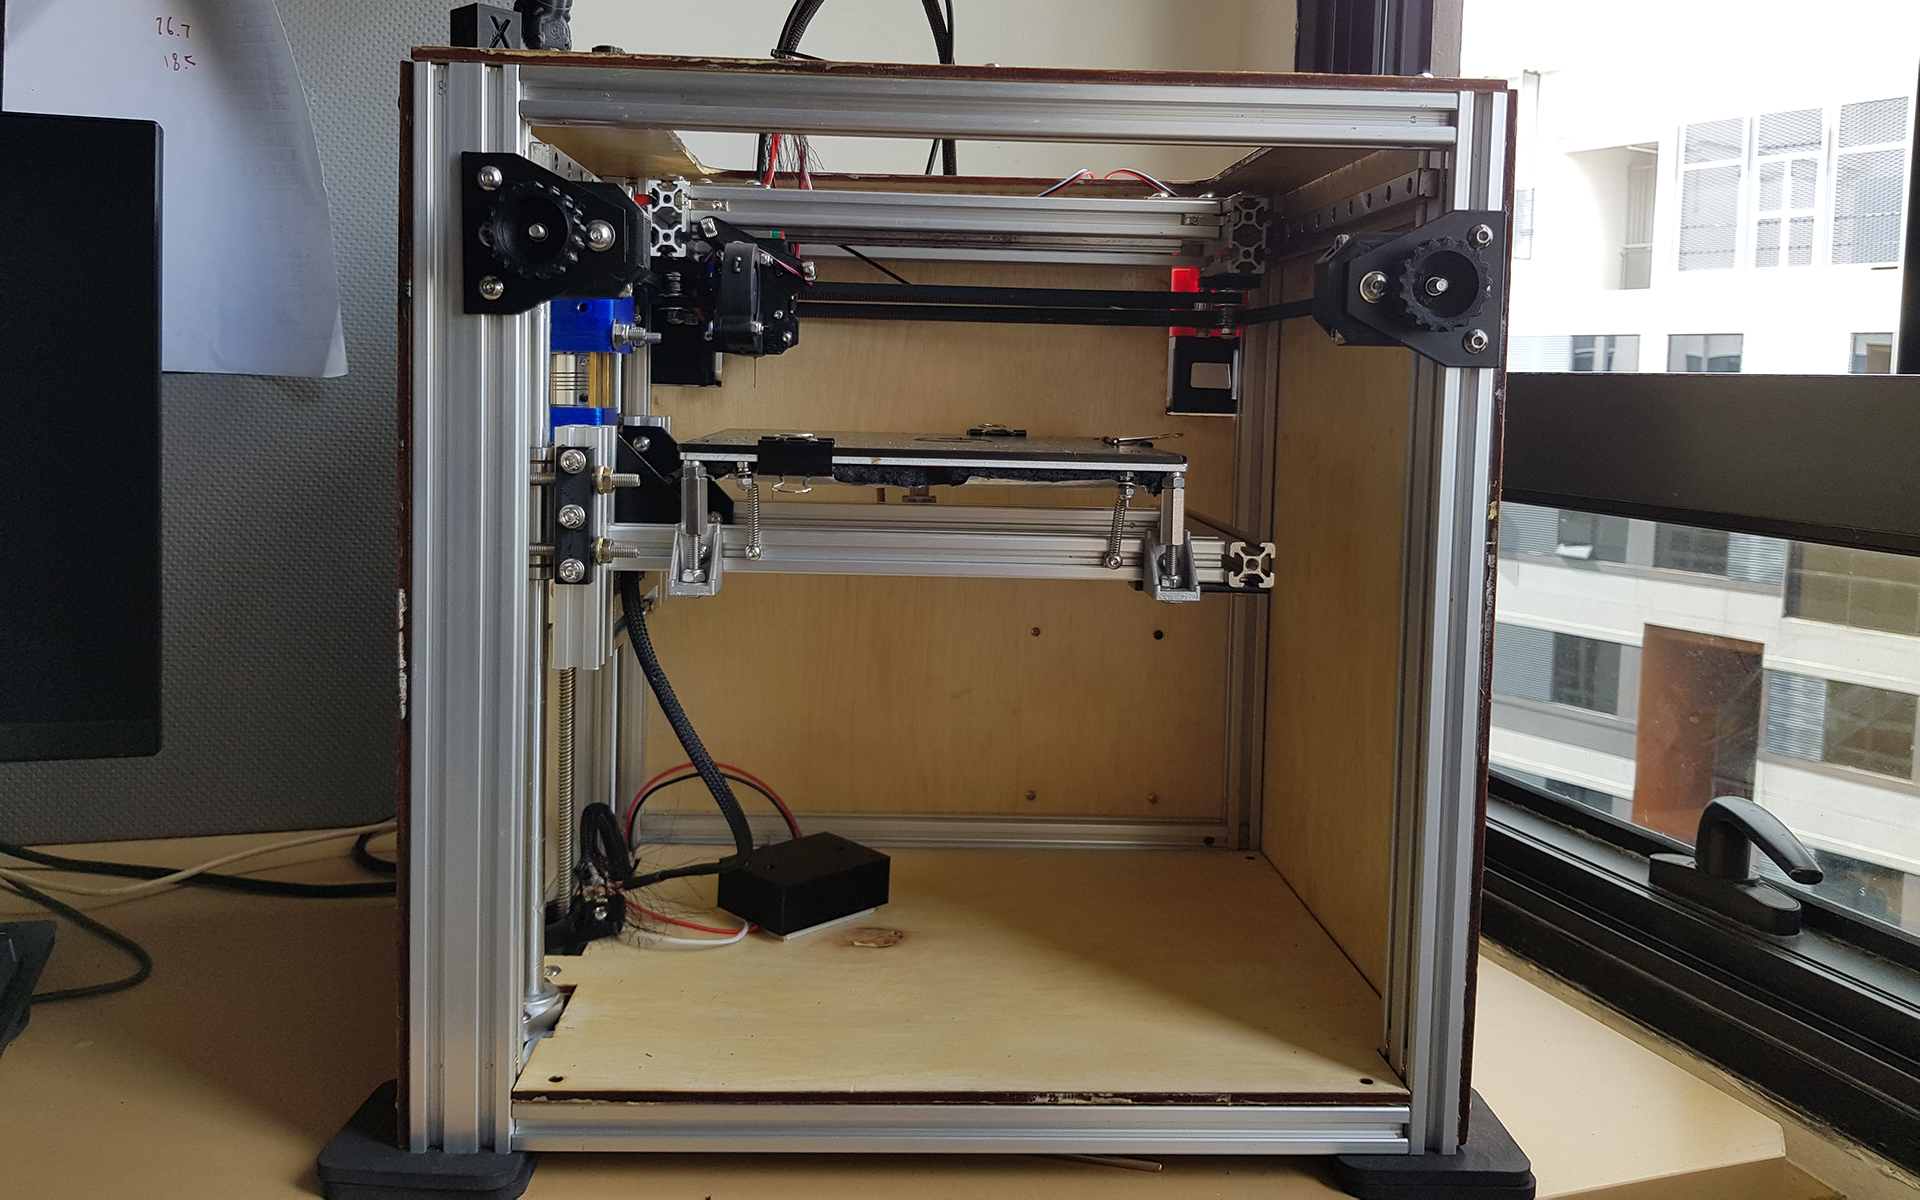 Self-made 3D printer